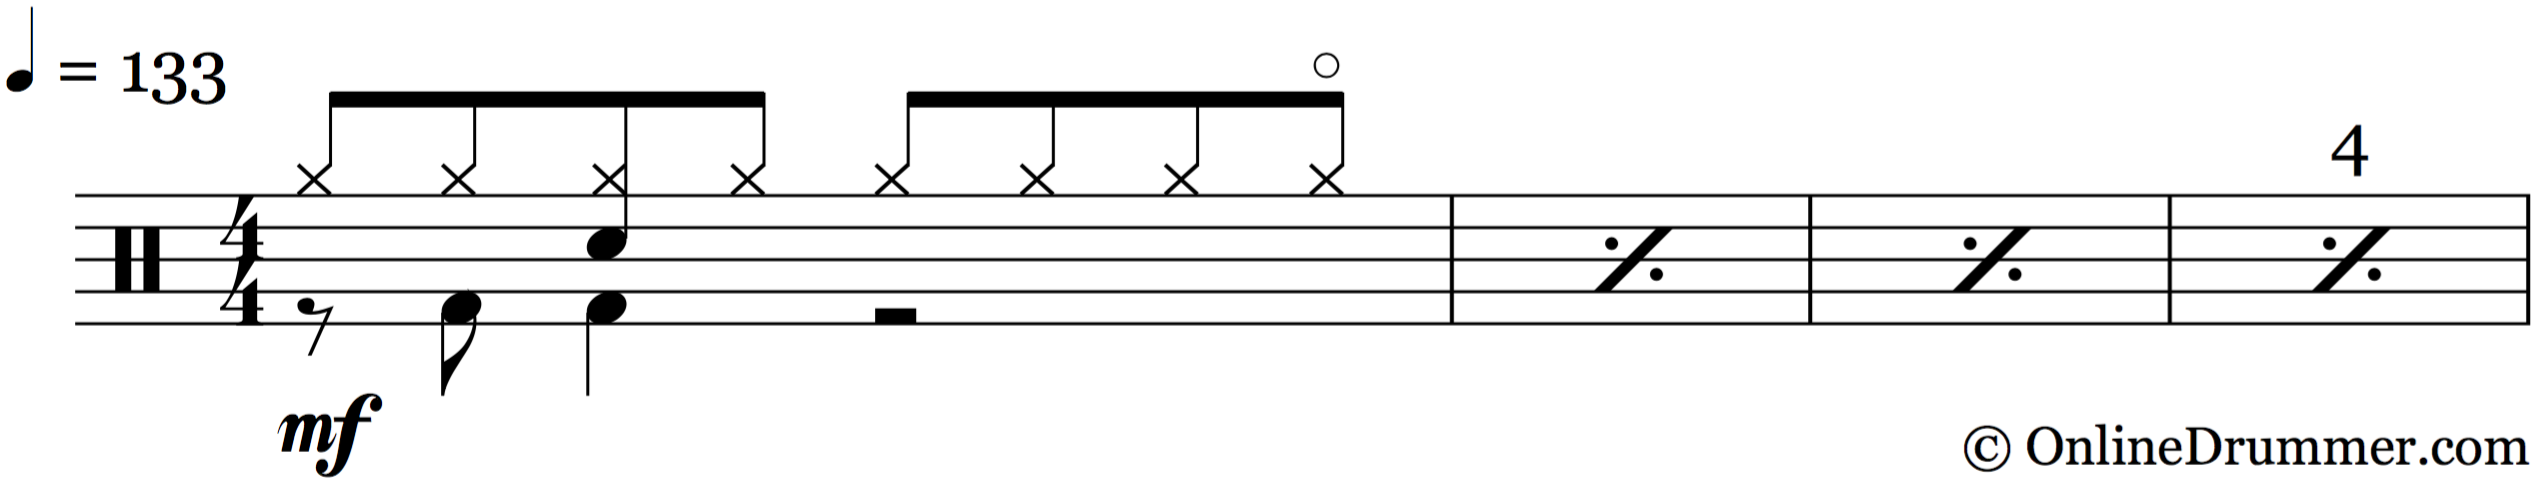 sultans of swing drum sheet music pdf